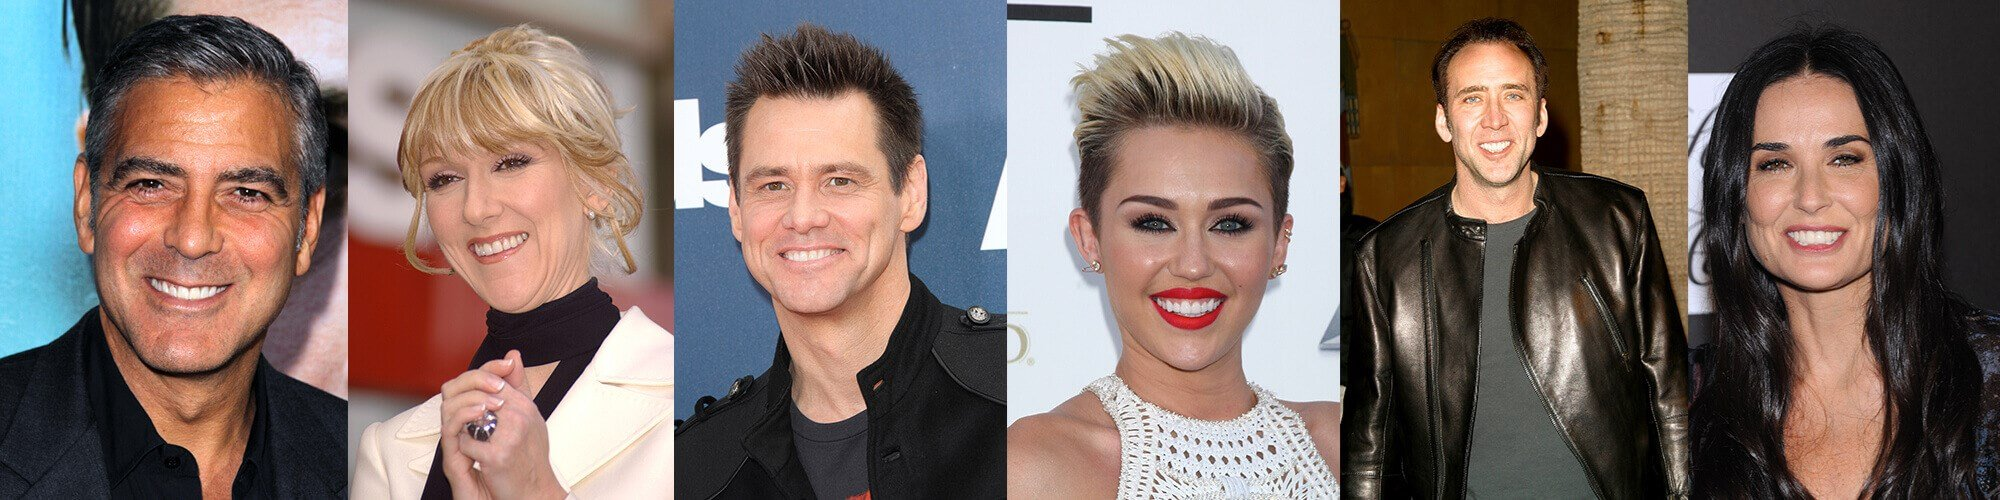 fame or smile Celebrity Smiles